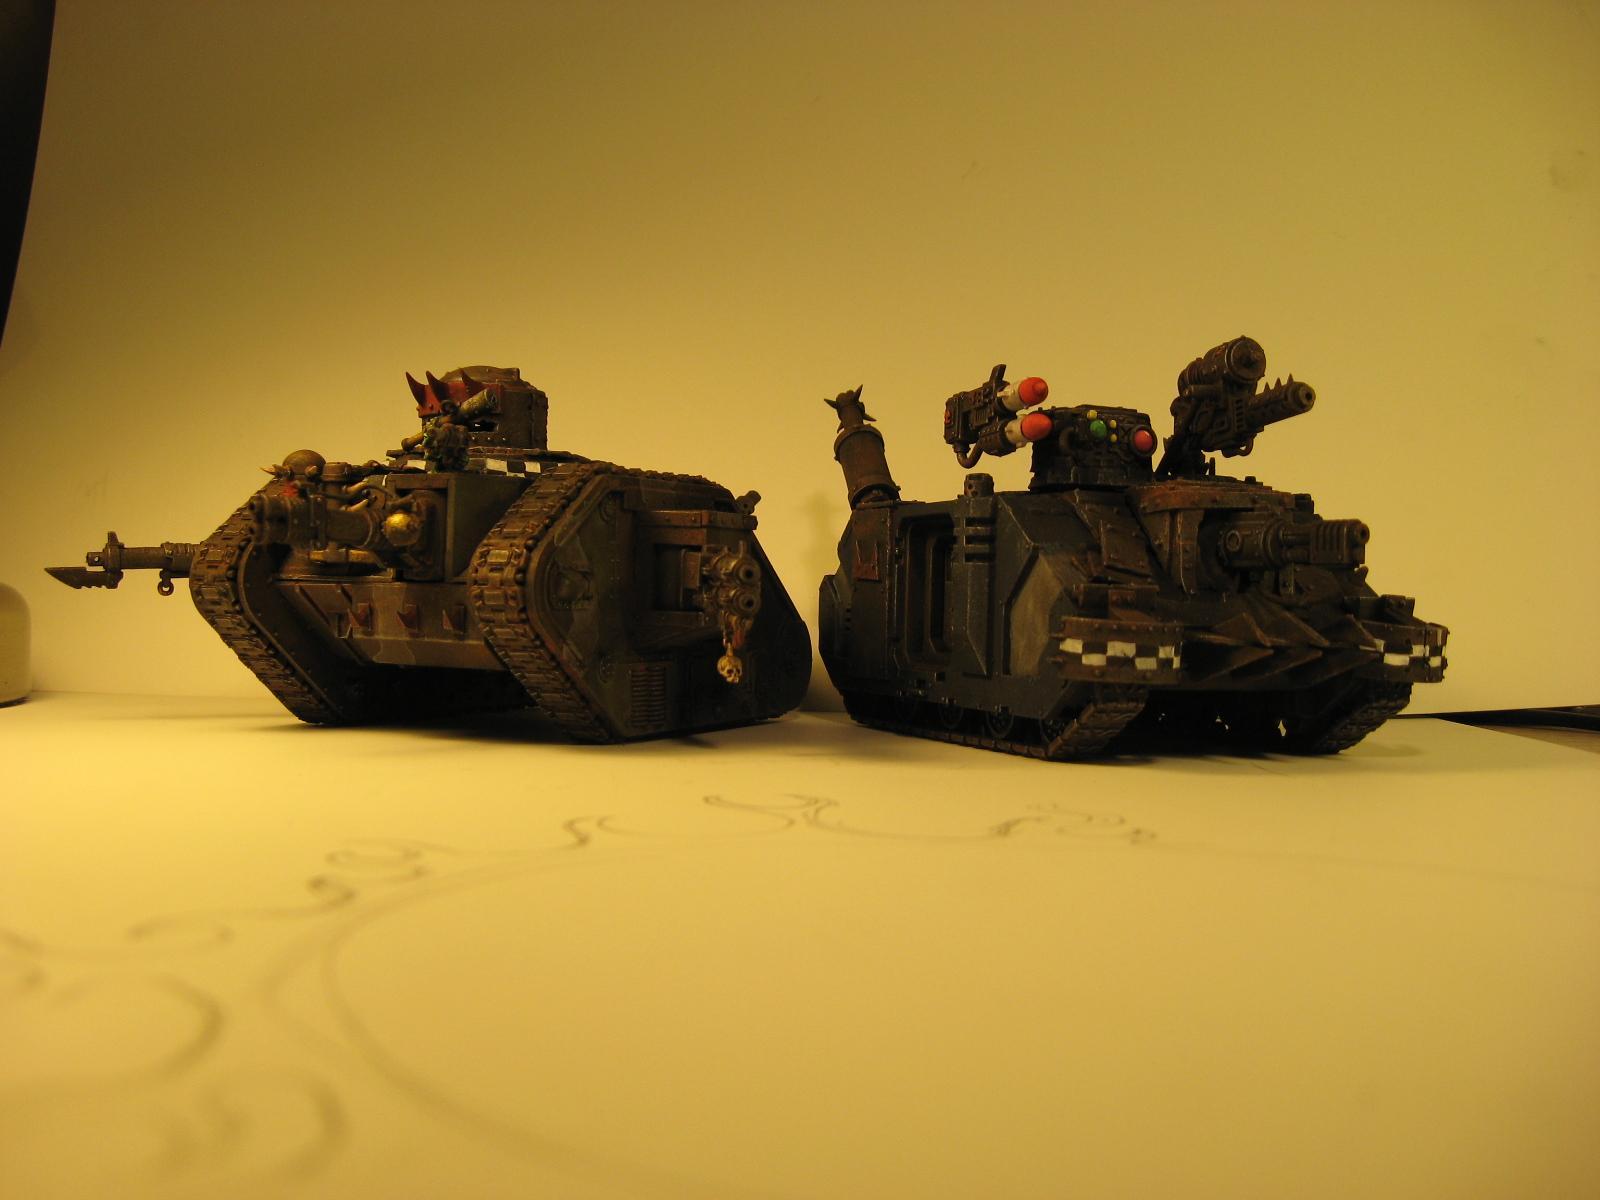 Looted Tanks, Orks, Skorcha, Warhammer 40,000